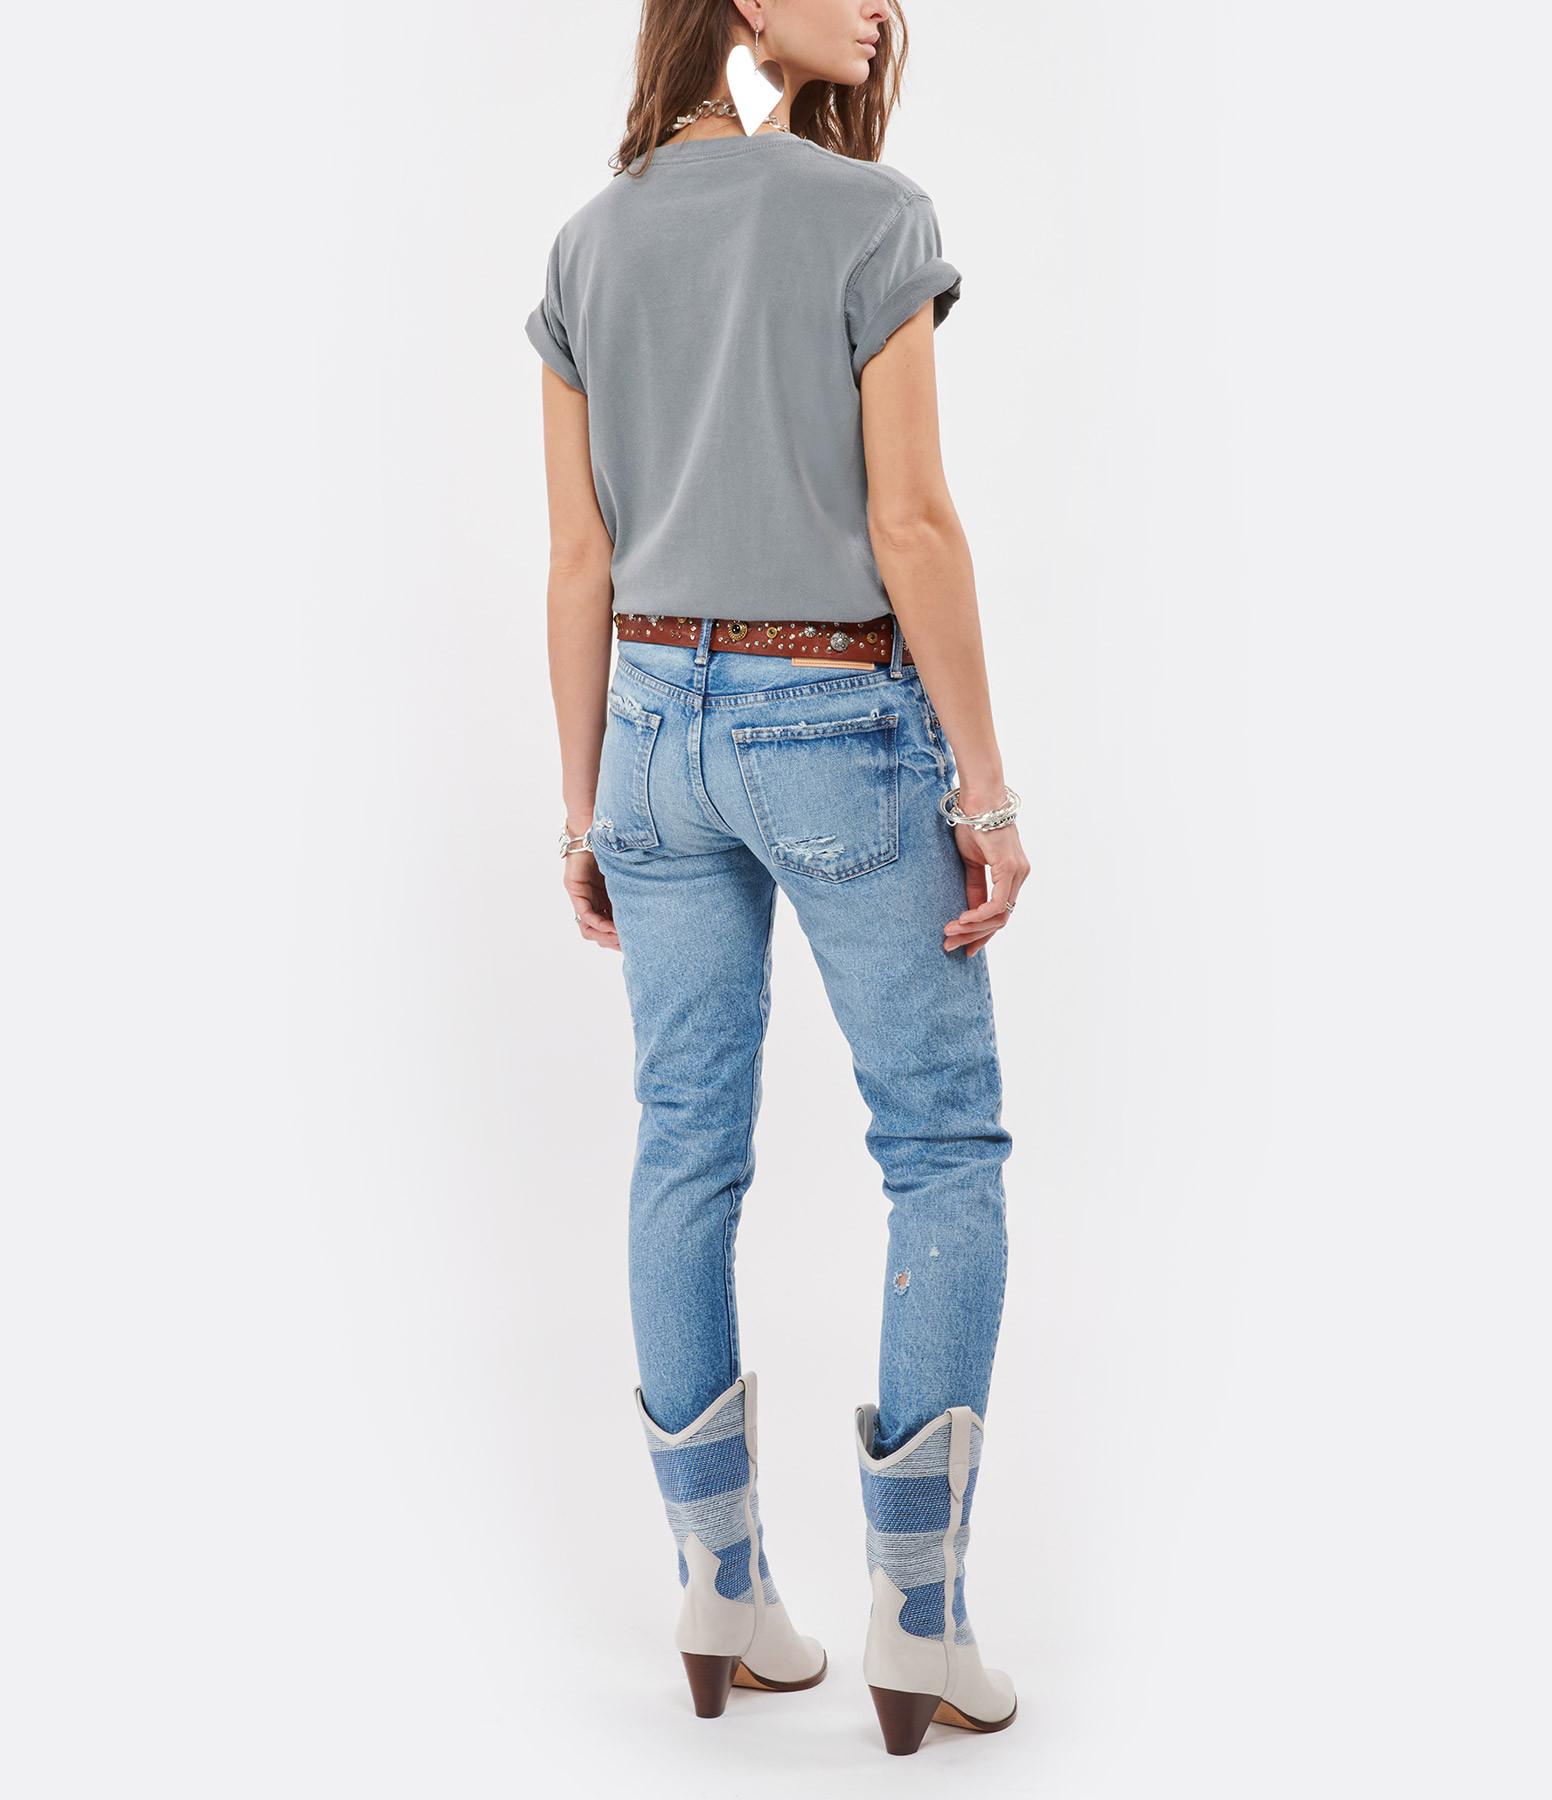 NEWTONE - Tee-shirt Trucker Joy Coton Gris